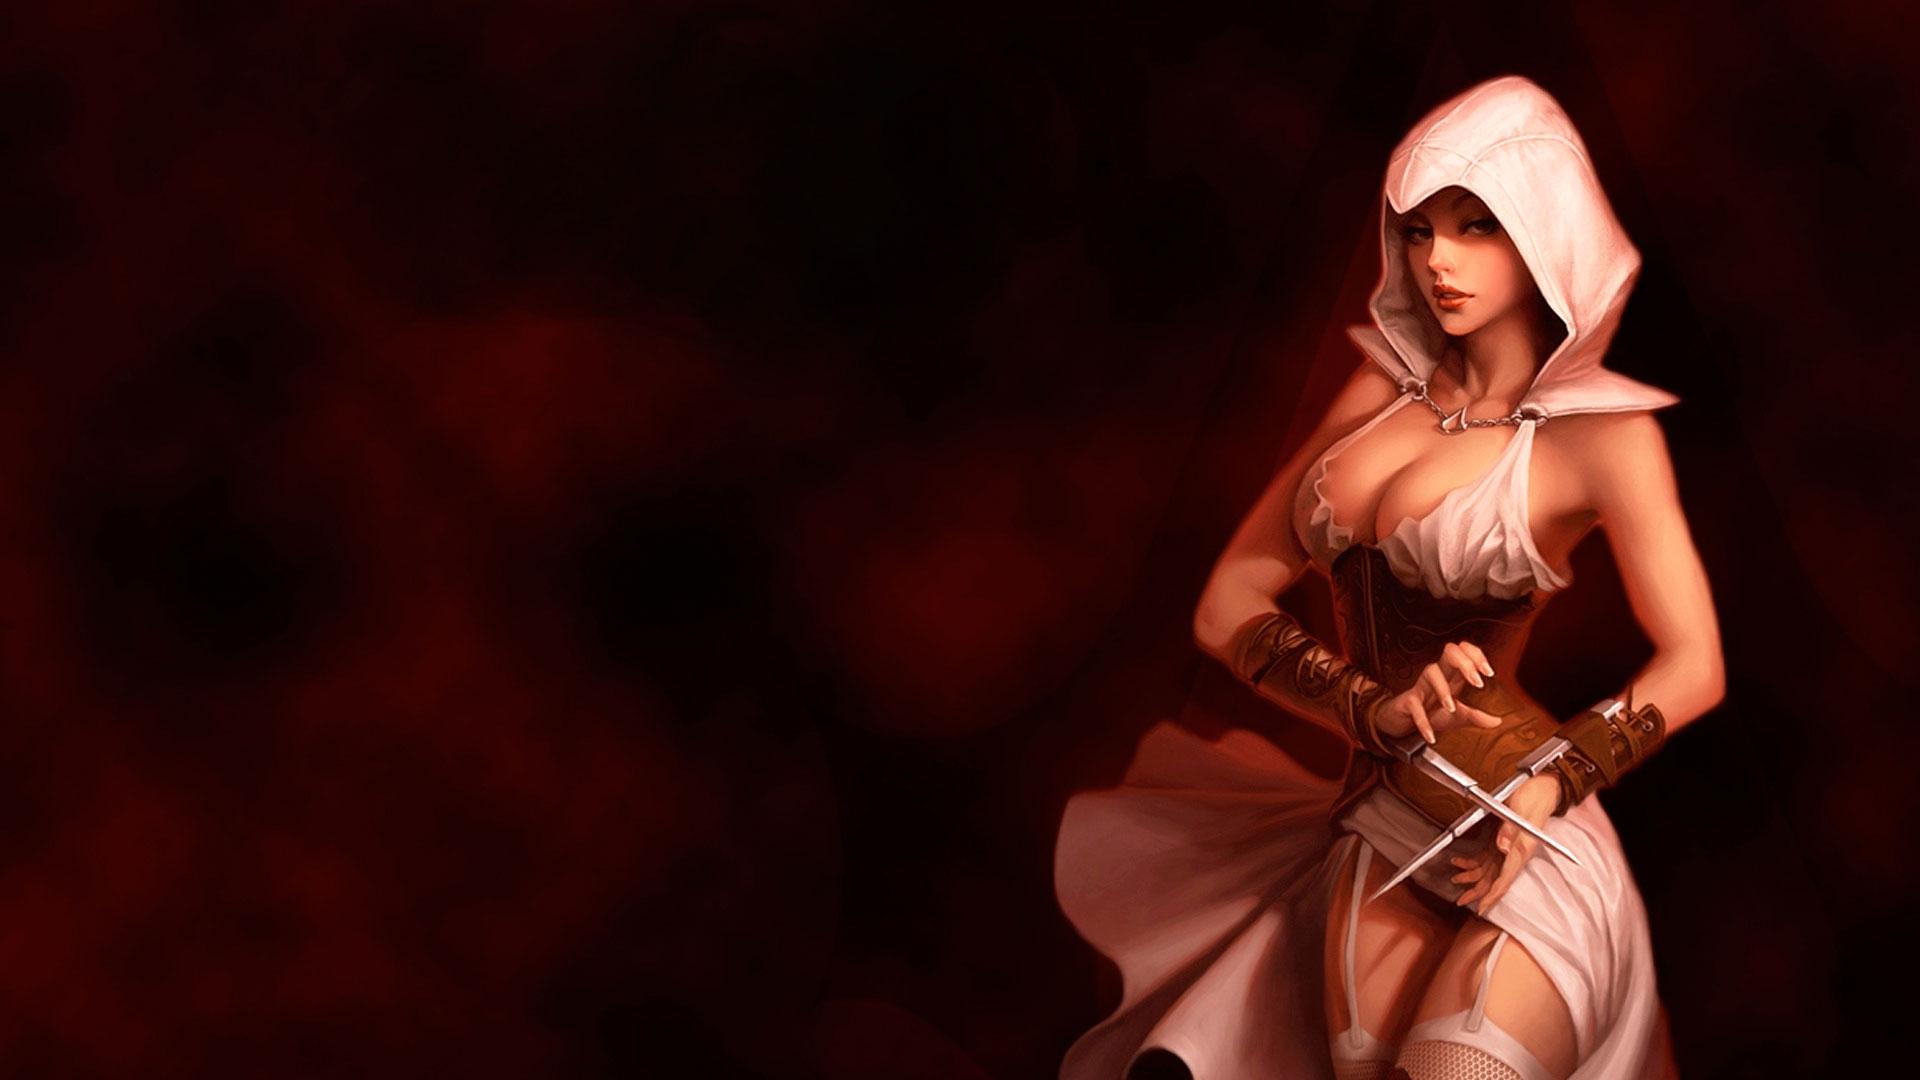 Assassin s creed women naked hardcore photos